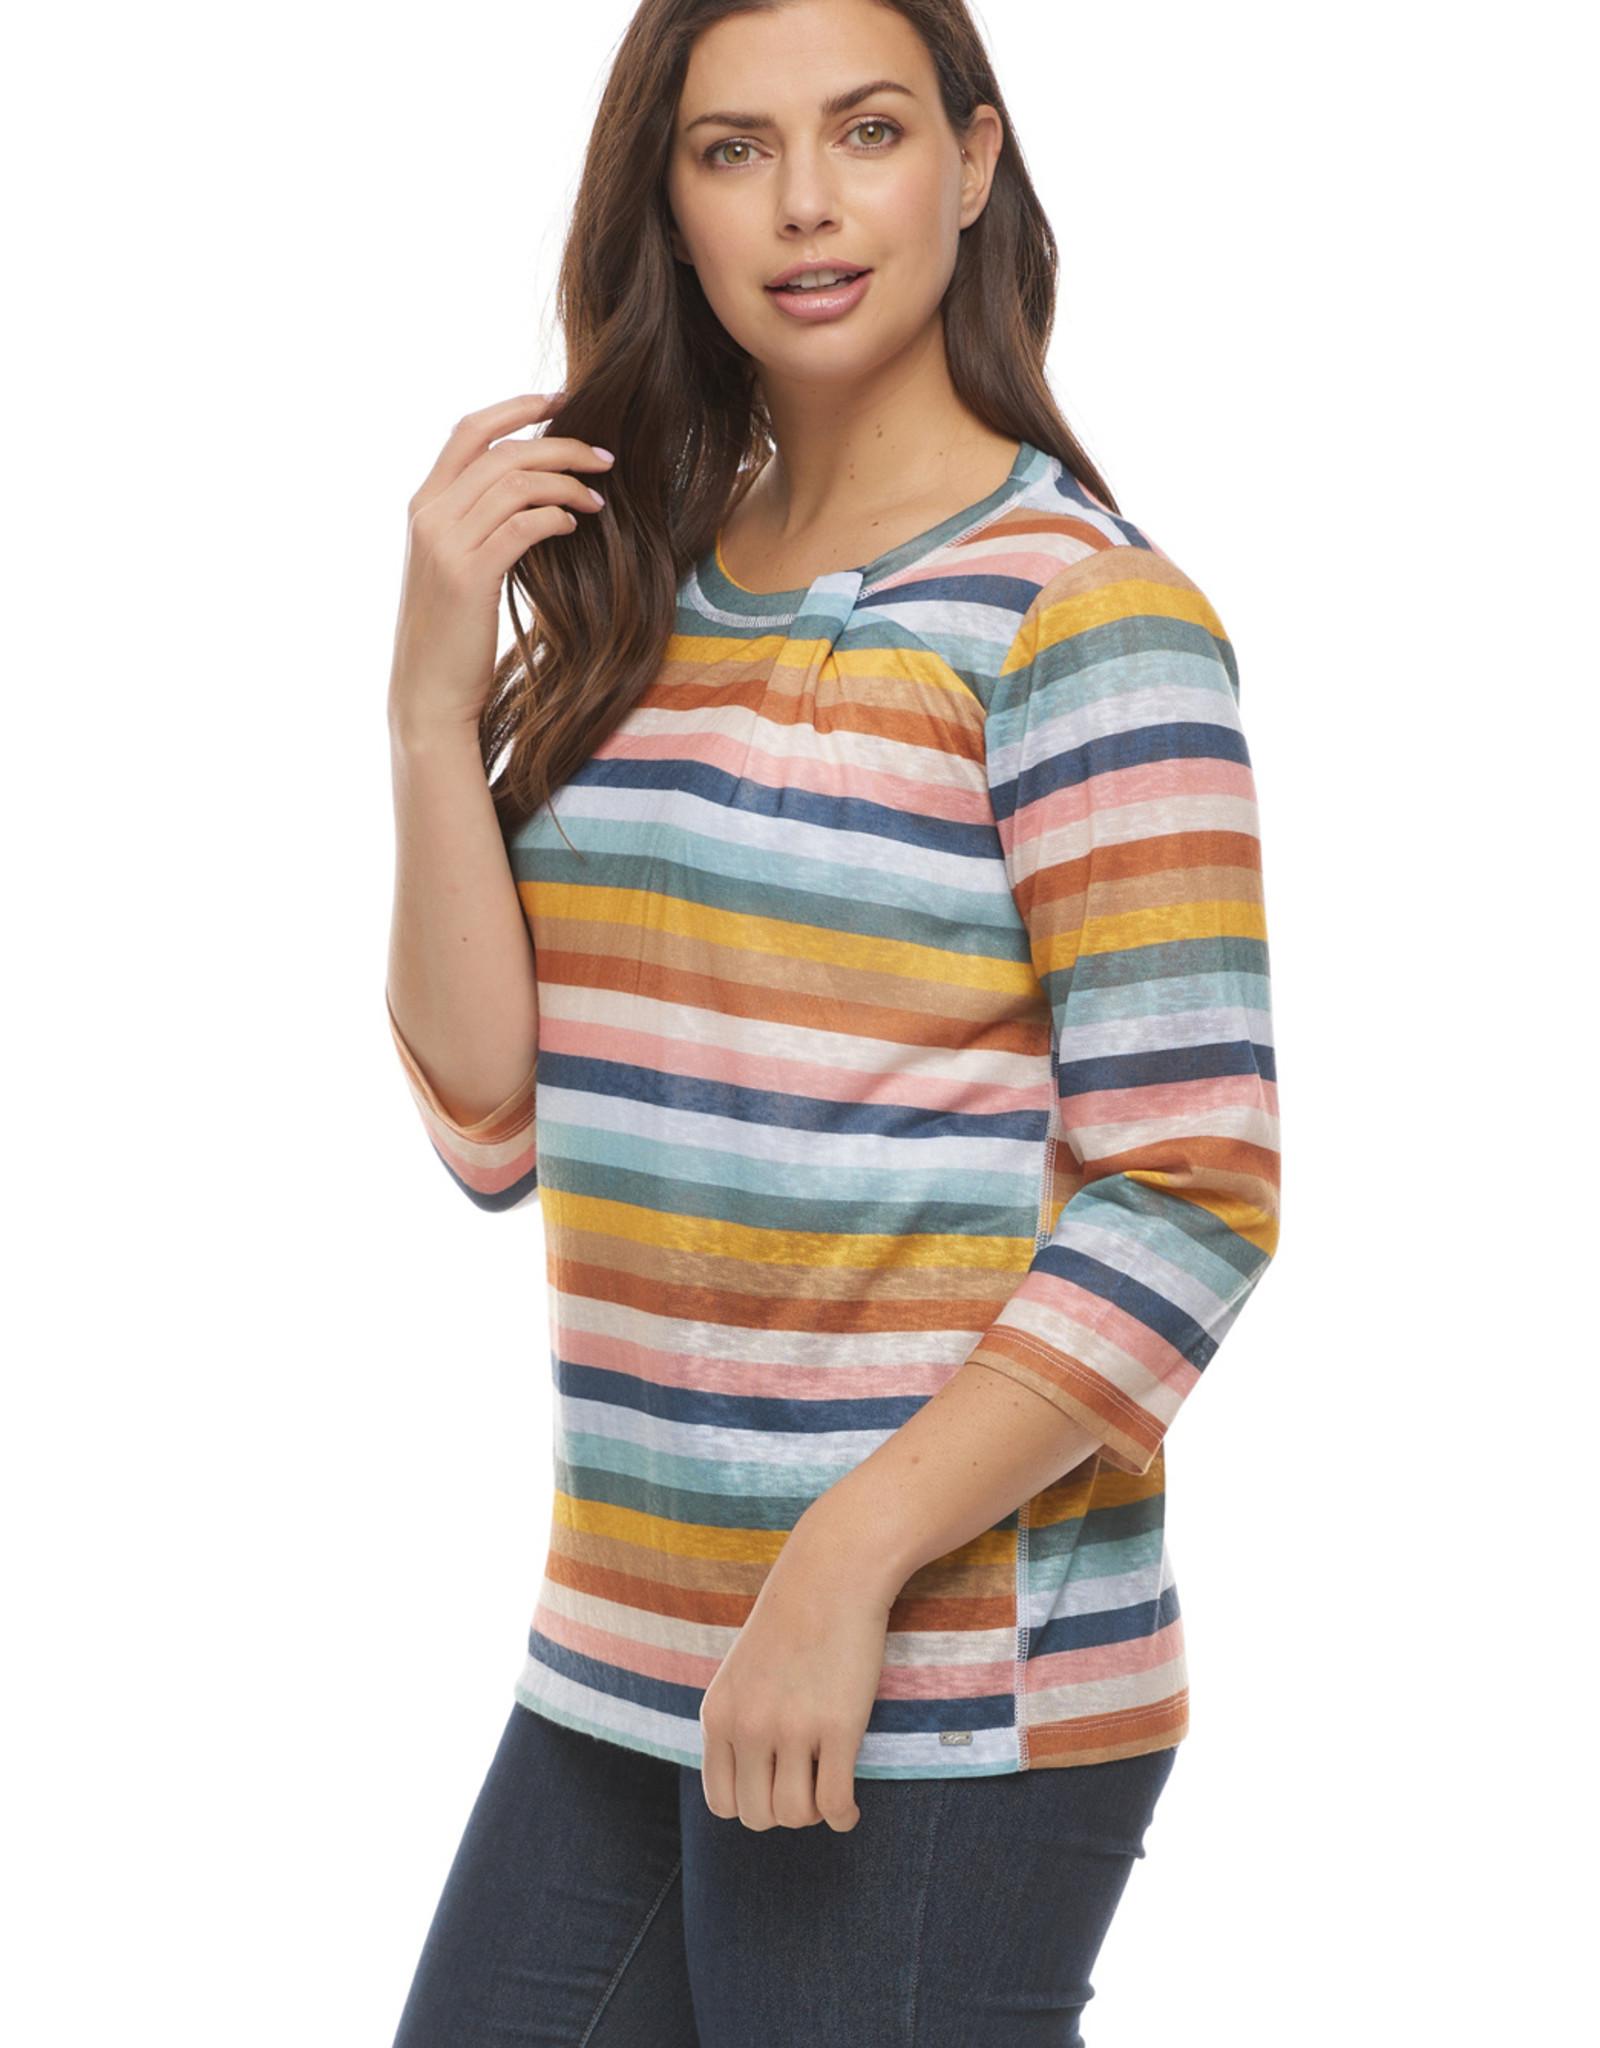 French Dressing Jeans FDJ Neck Twist Knit Top 1989451